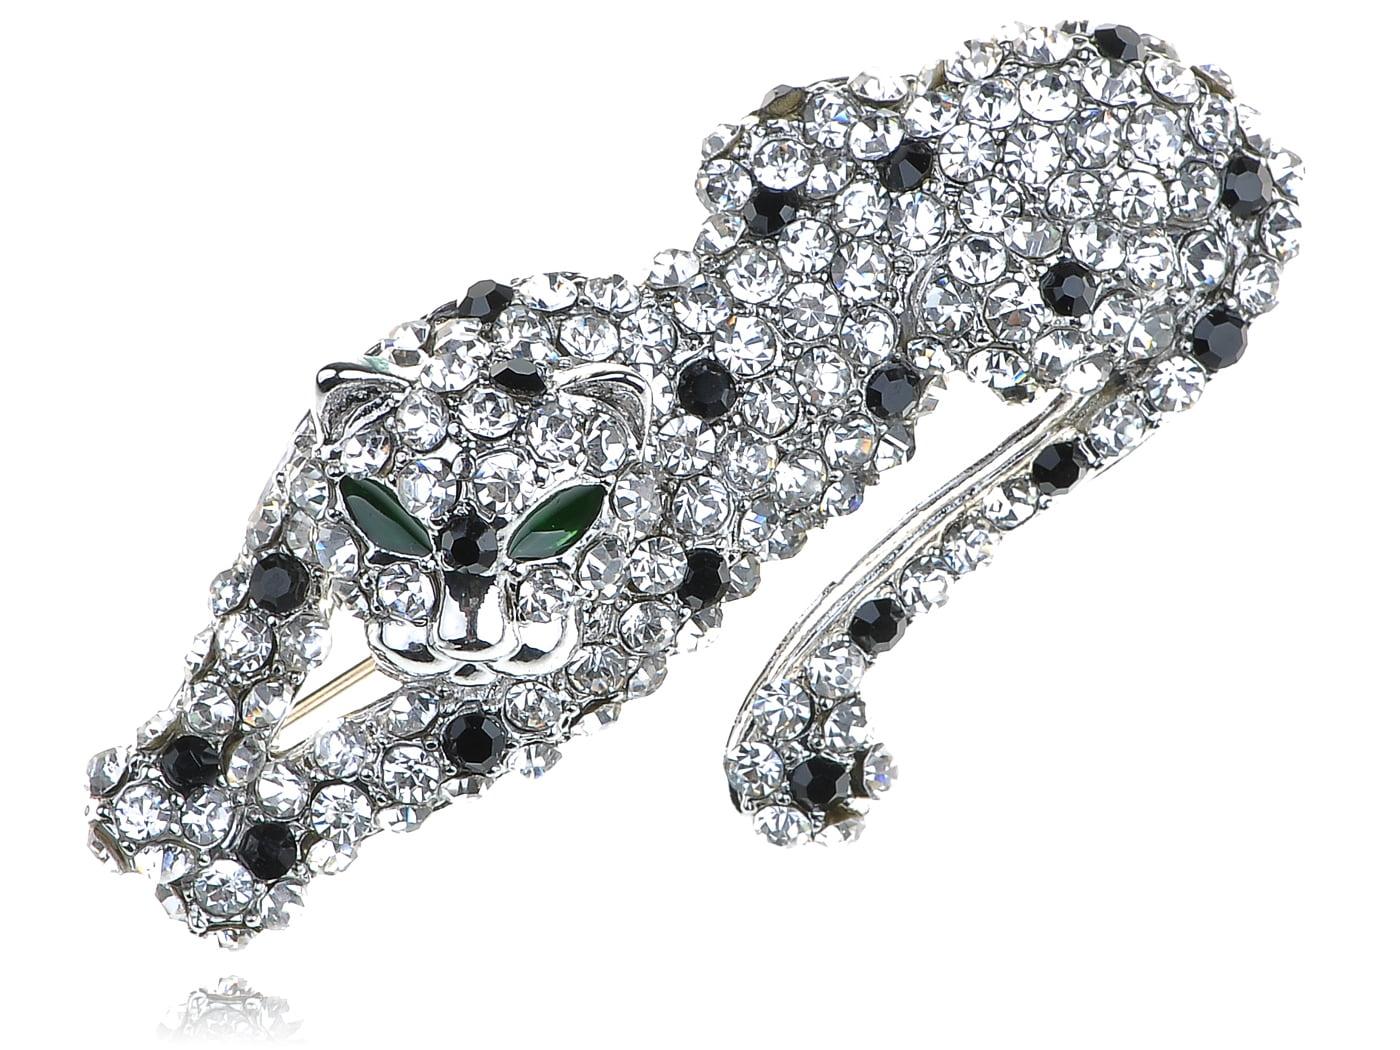 Clear Crystal Rhinestone Silver Tone Fierce Looking Cougar Animal Pin Brooch by